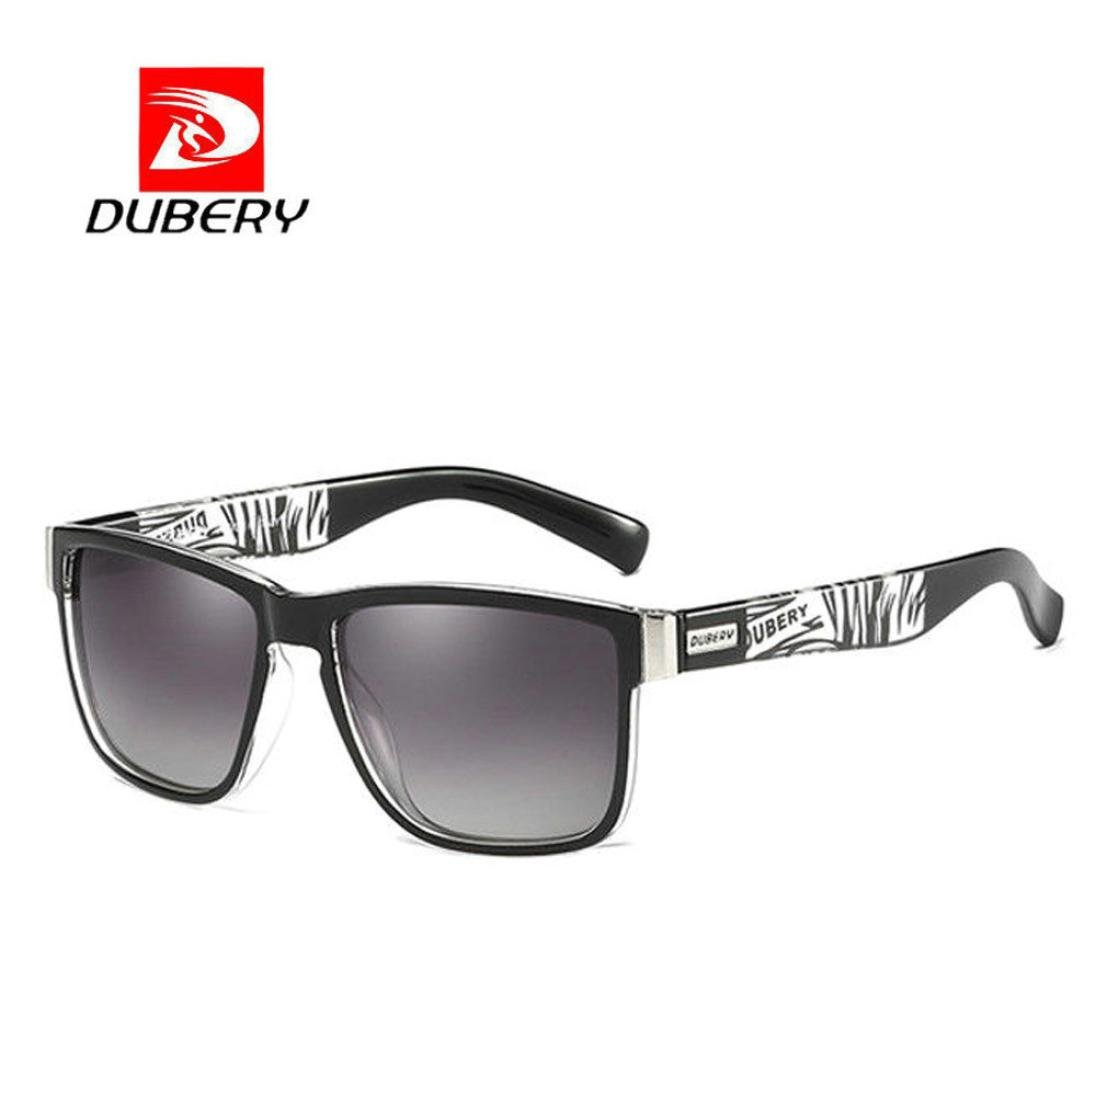 0dd883e2d1 Amazon.com  DUBERY Sunglasses Men s Polarized Sunglasses Outdoor Driving  Men Women Sport Frame Fishing Hunting Boating Glasses New (C)  Beauty